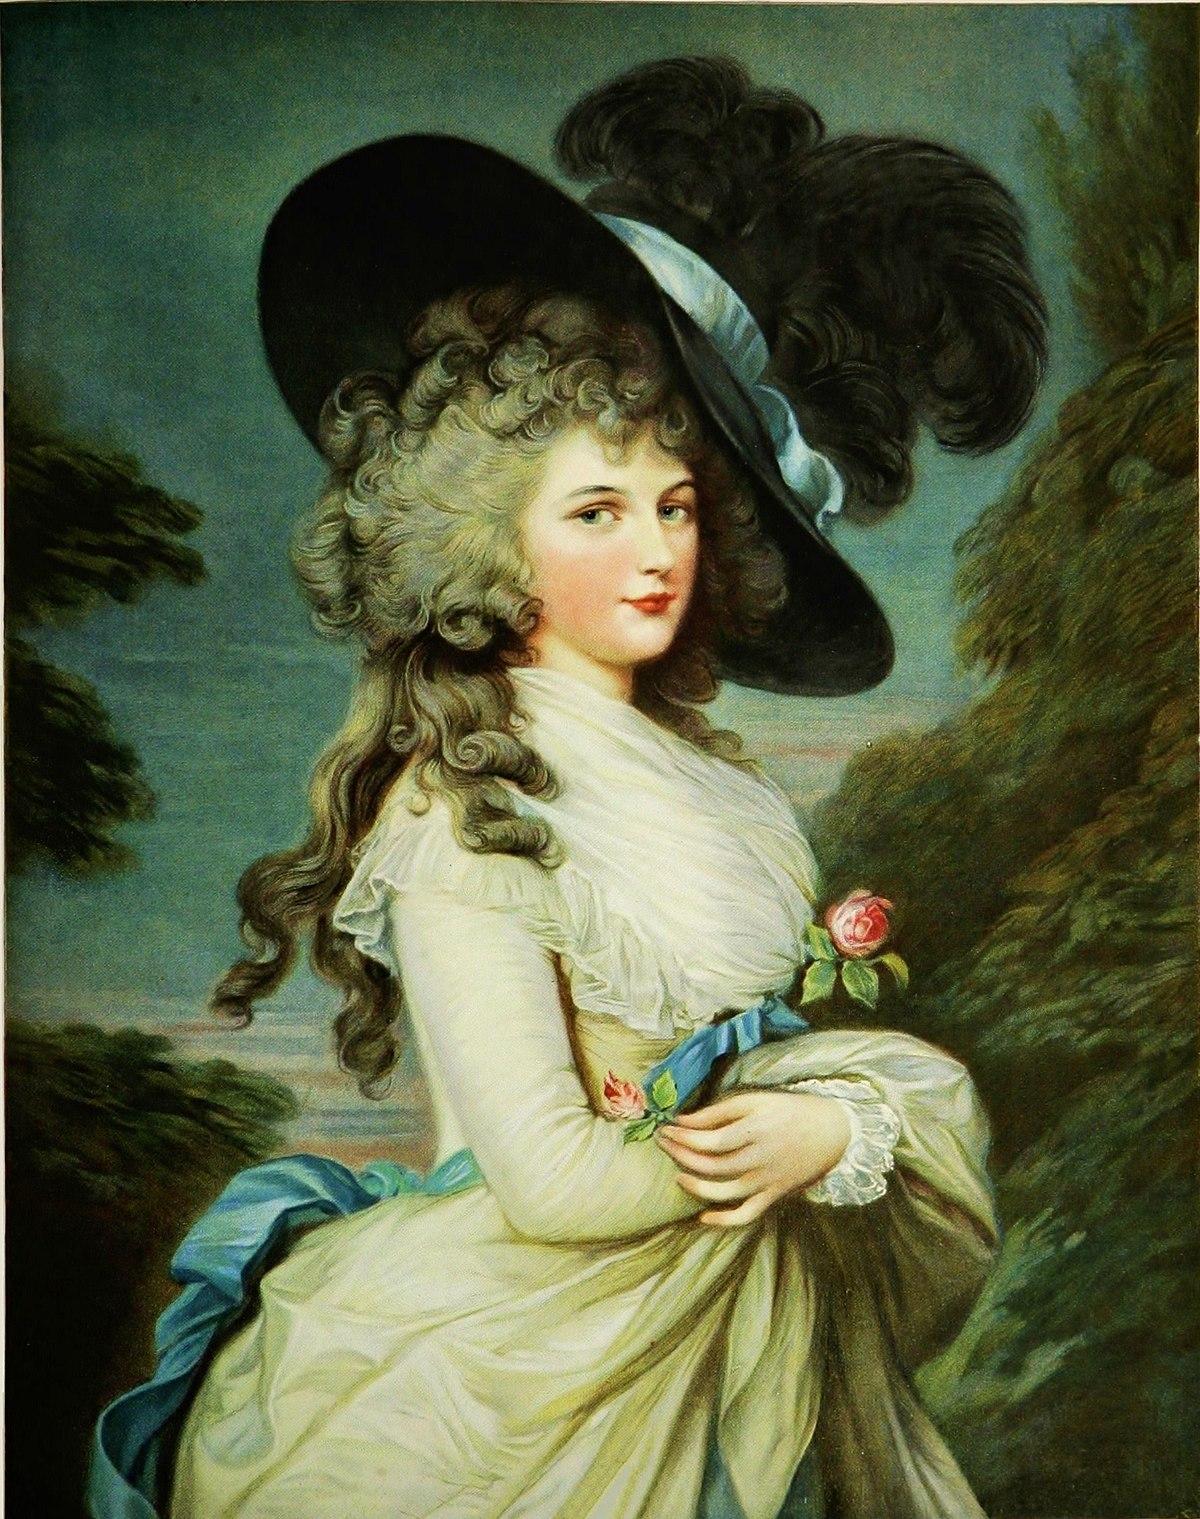 Georgiana Cavendish, Duchess of Devonshire - Wikipedia